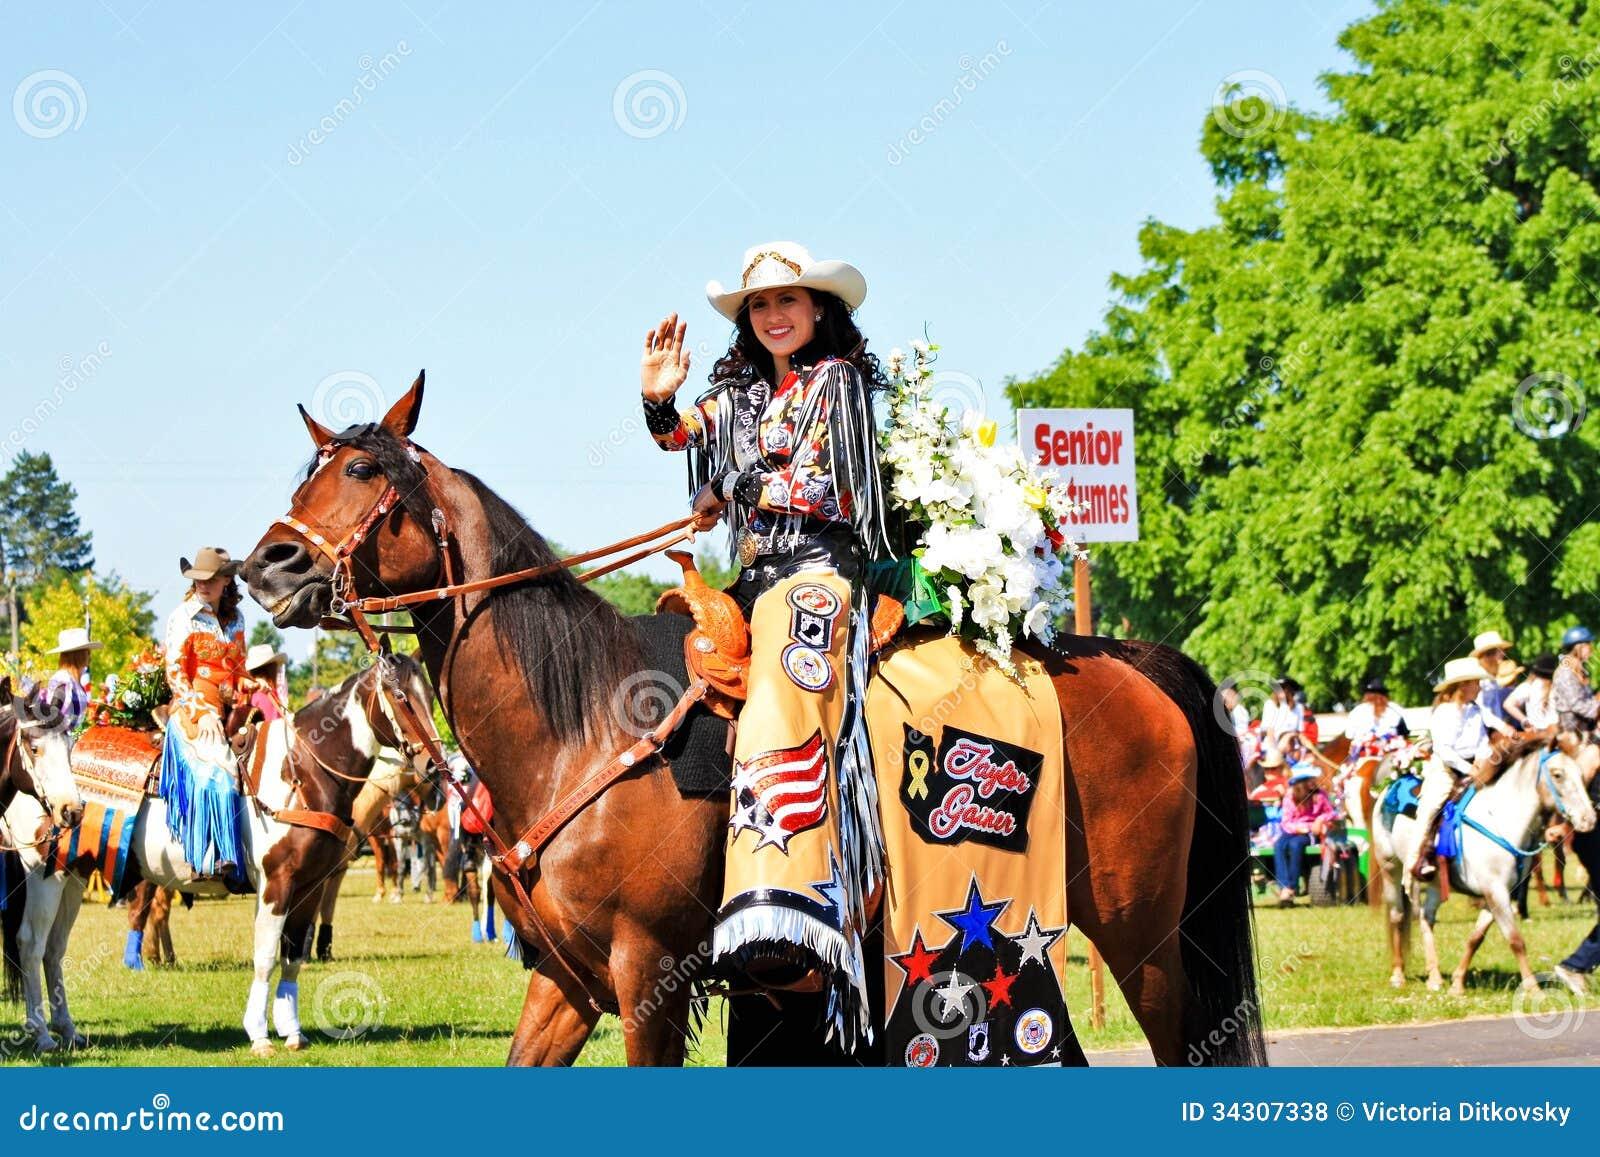 Rodeo Queen Editorial Stock Photo Image Of Teen Sunlight